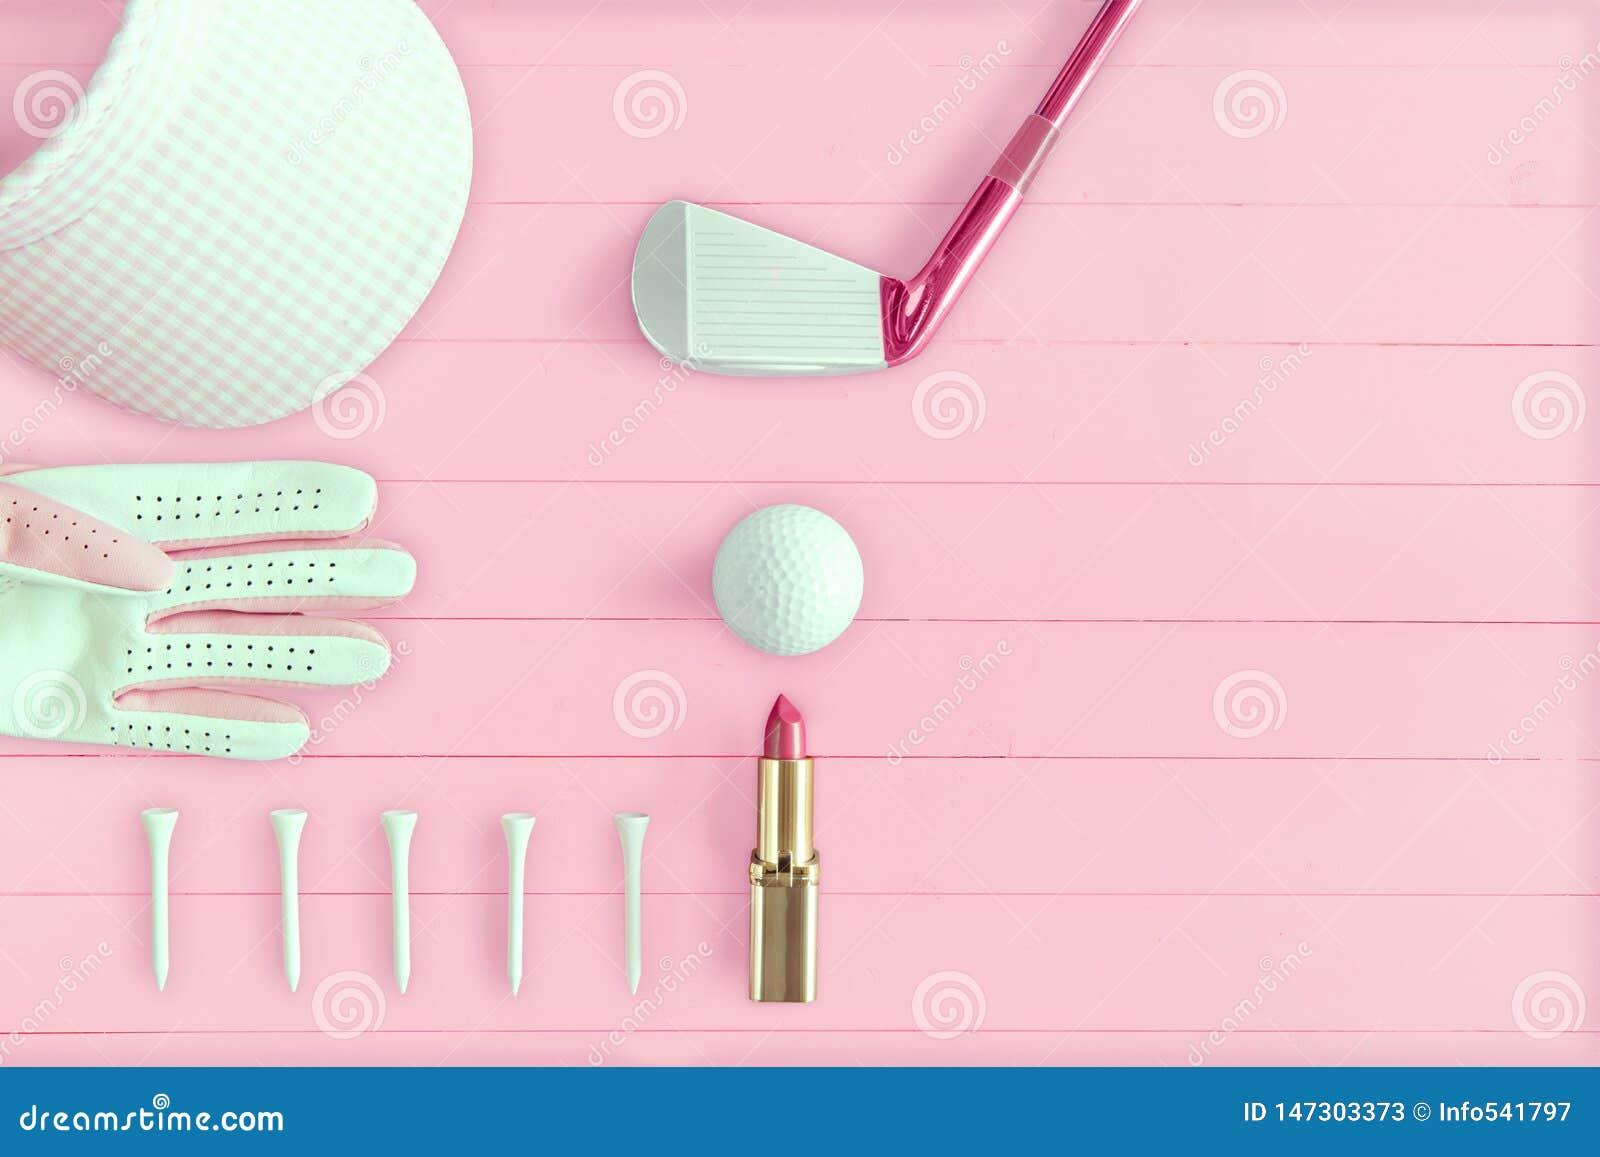 Golf club, golf ball, golf glove, tees and golf visor on pink wooden